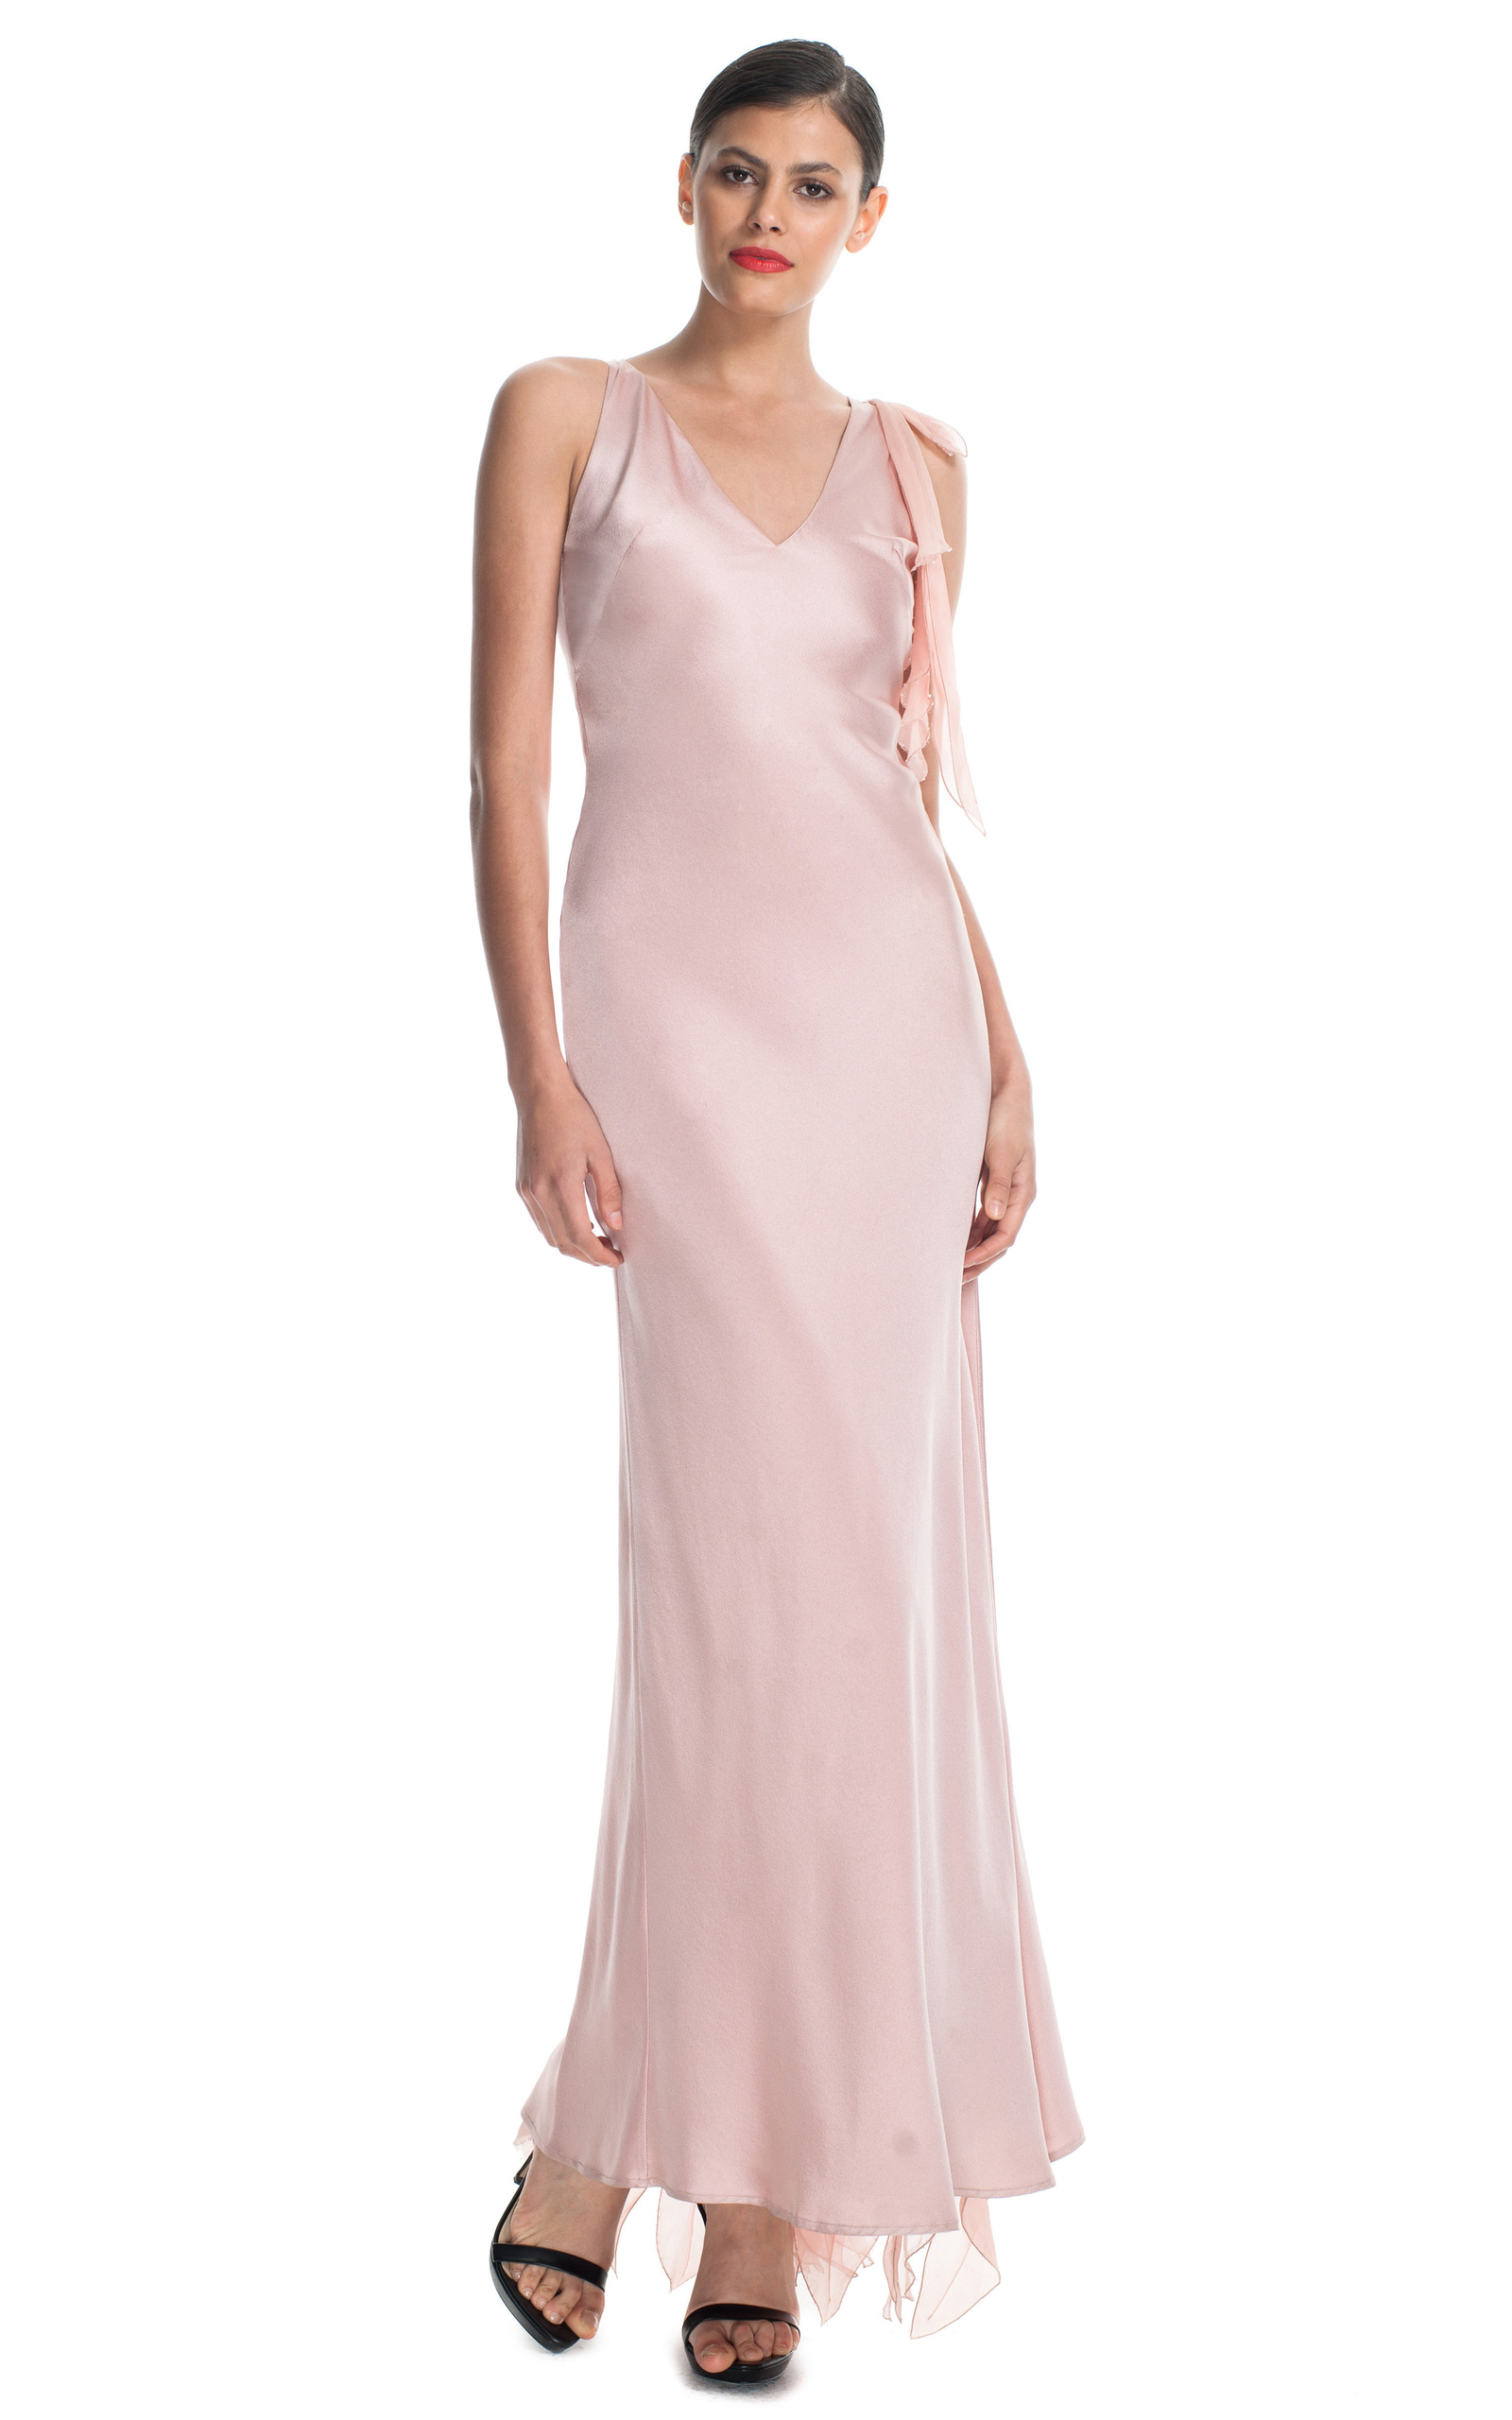 Gianni Versace Silk Evening Gown by New York Vintage | Moda Operandi